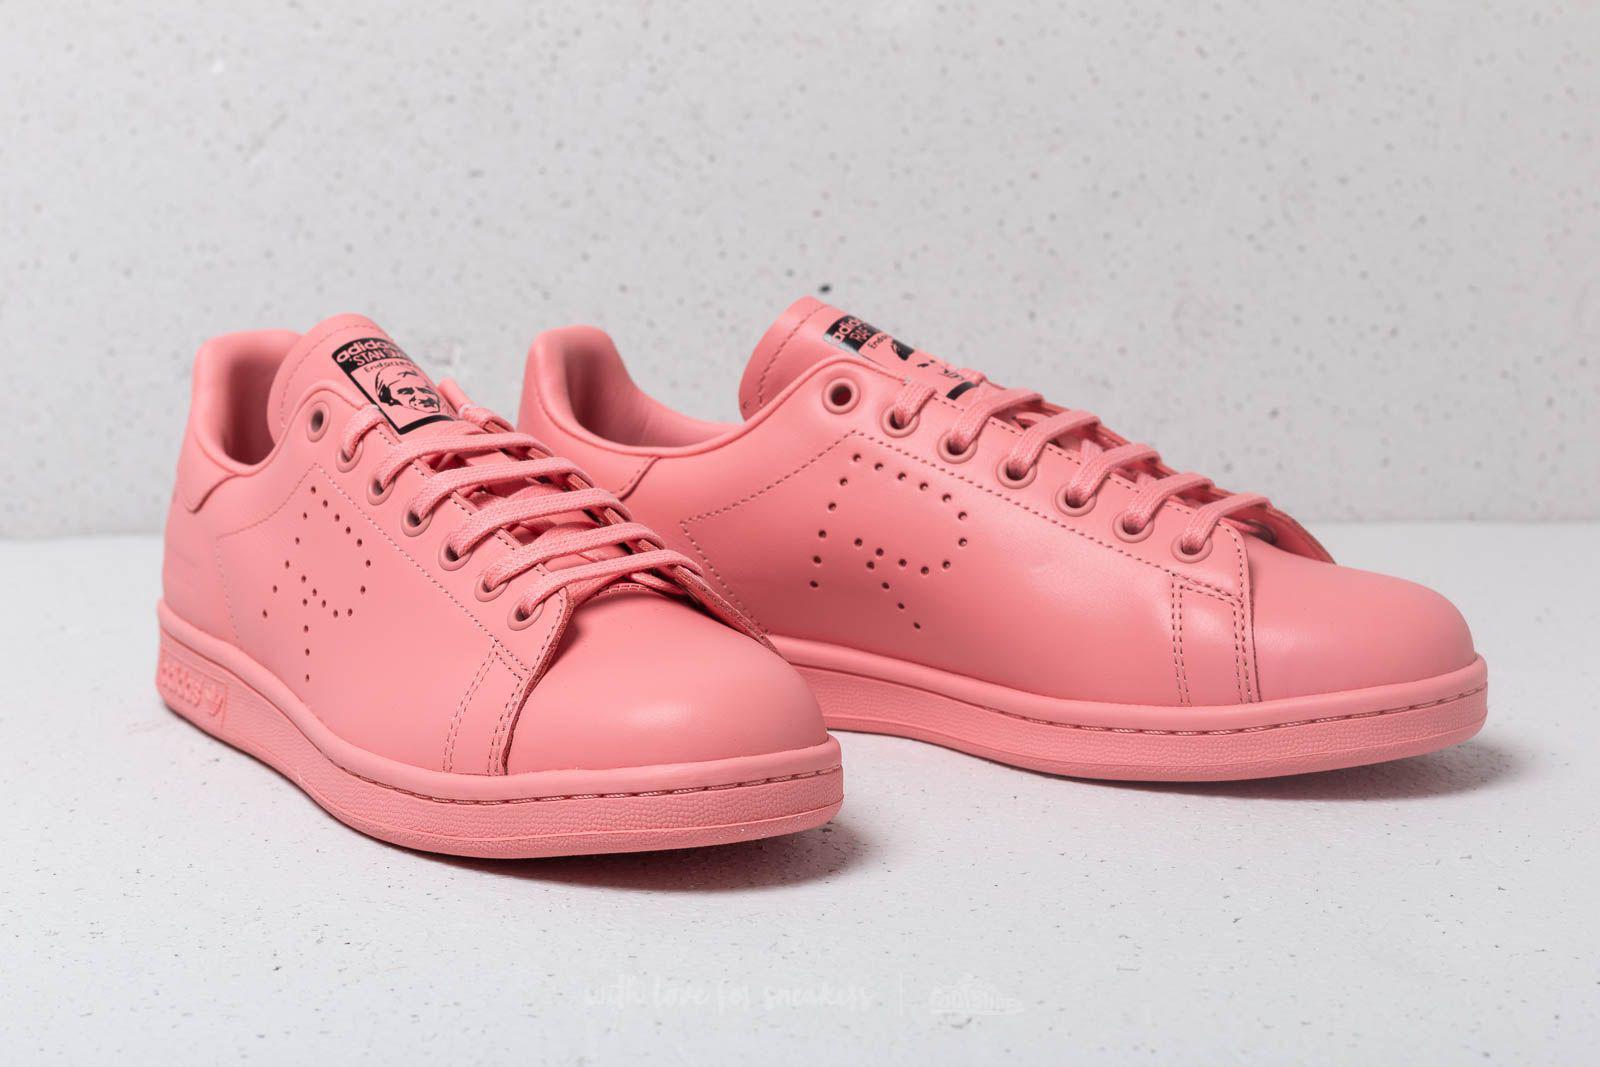 adidas stan smith raf simons rosse